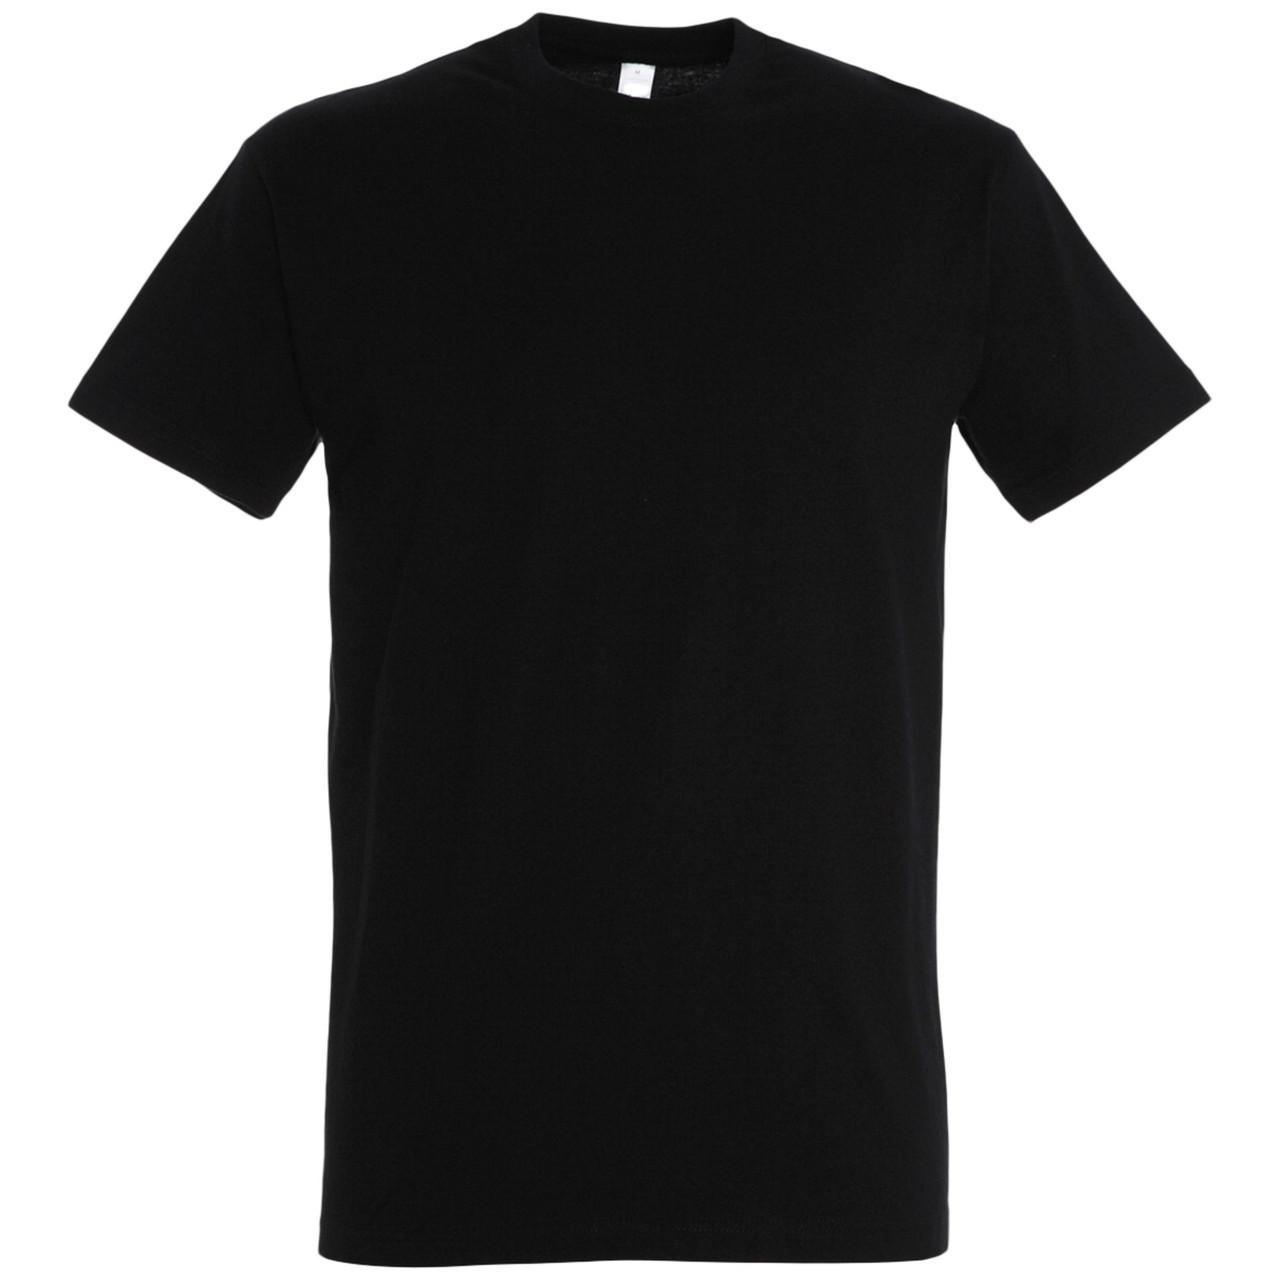 Oднотонная футболка | Черная | 160 гр. | S